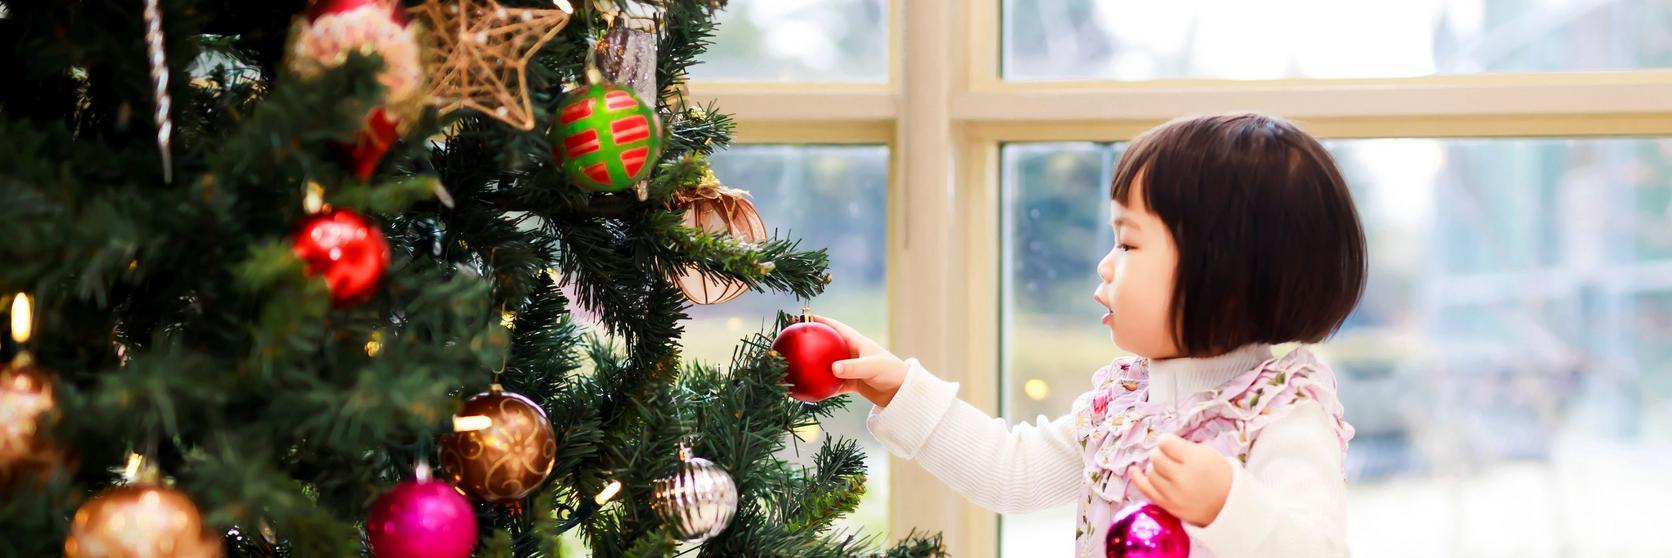 festive-family-decorating